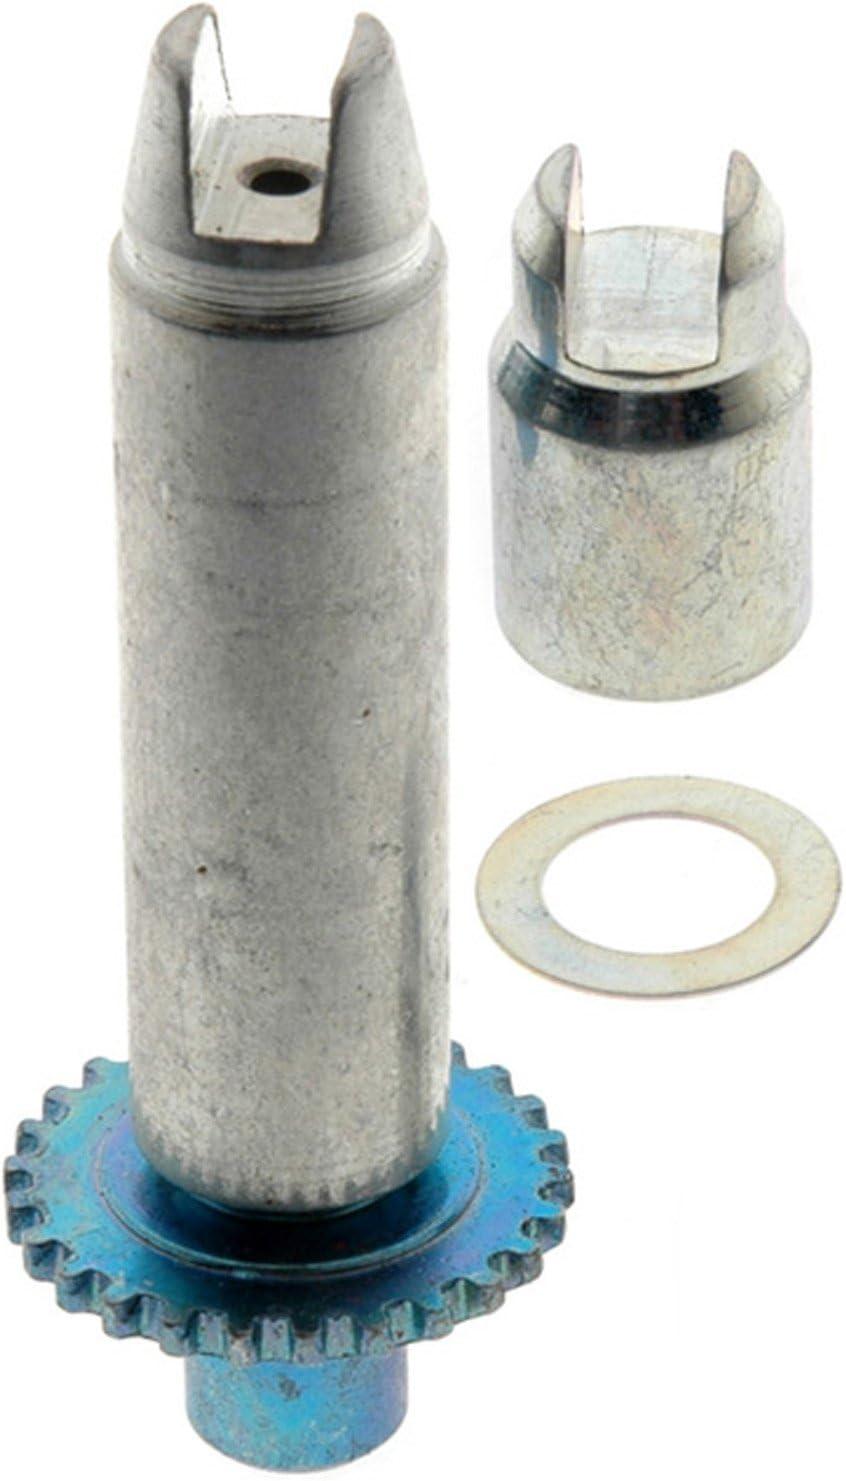 Drum Brake Adjusting Spring Kit-Brake Shoe Adjuster Kits Rear//Front-Right